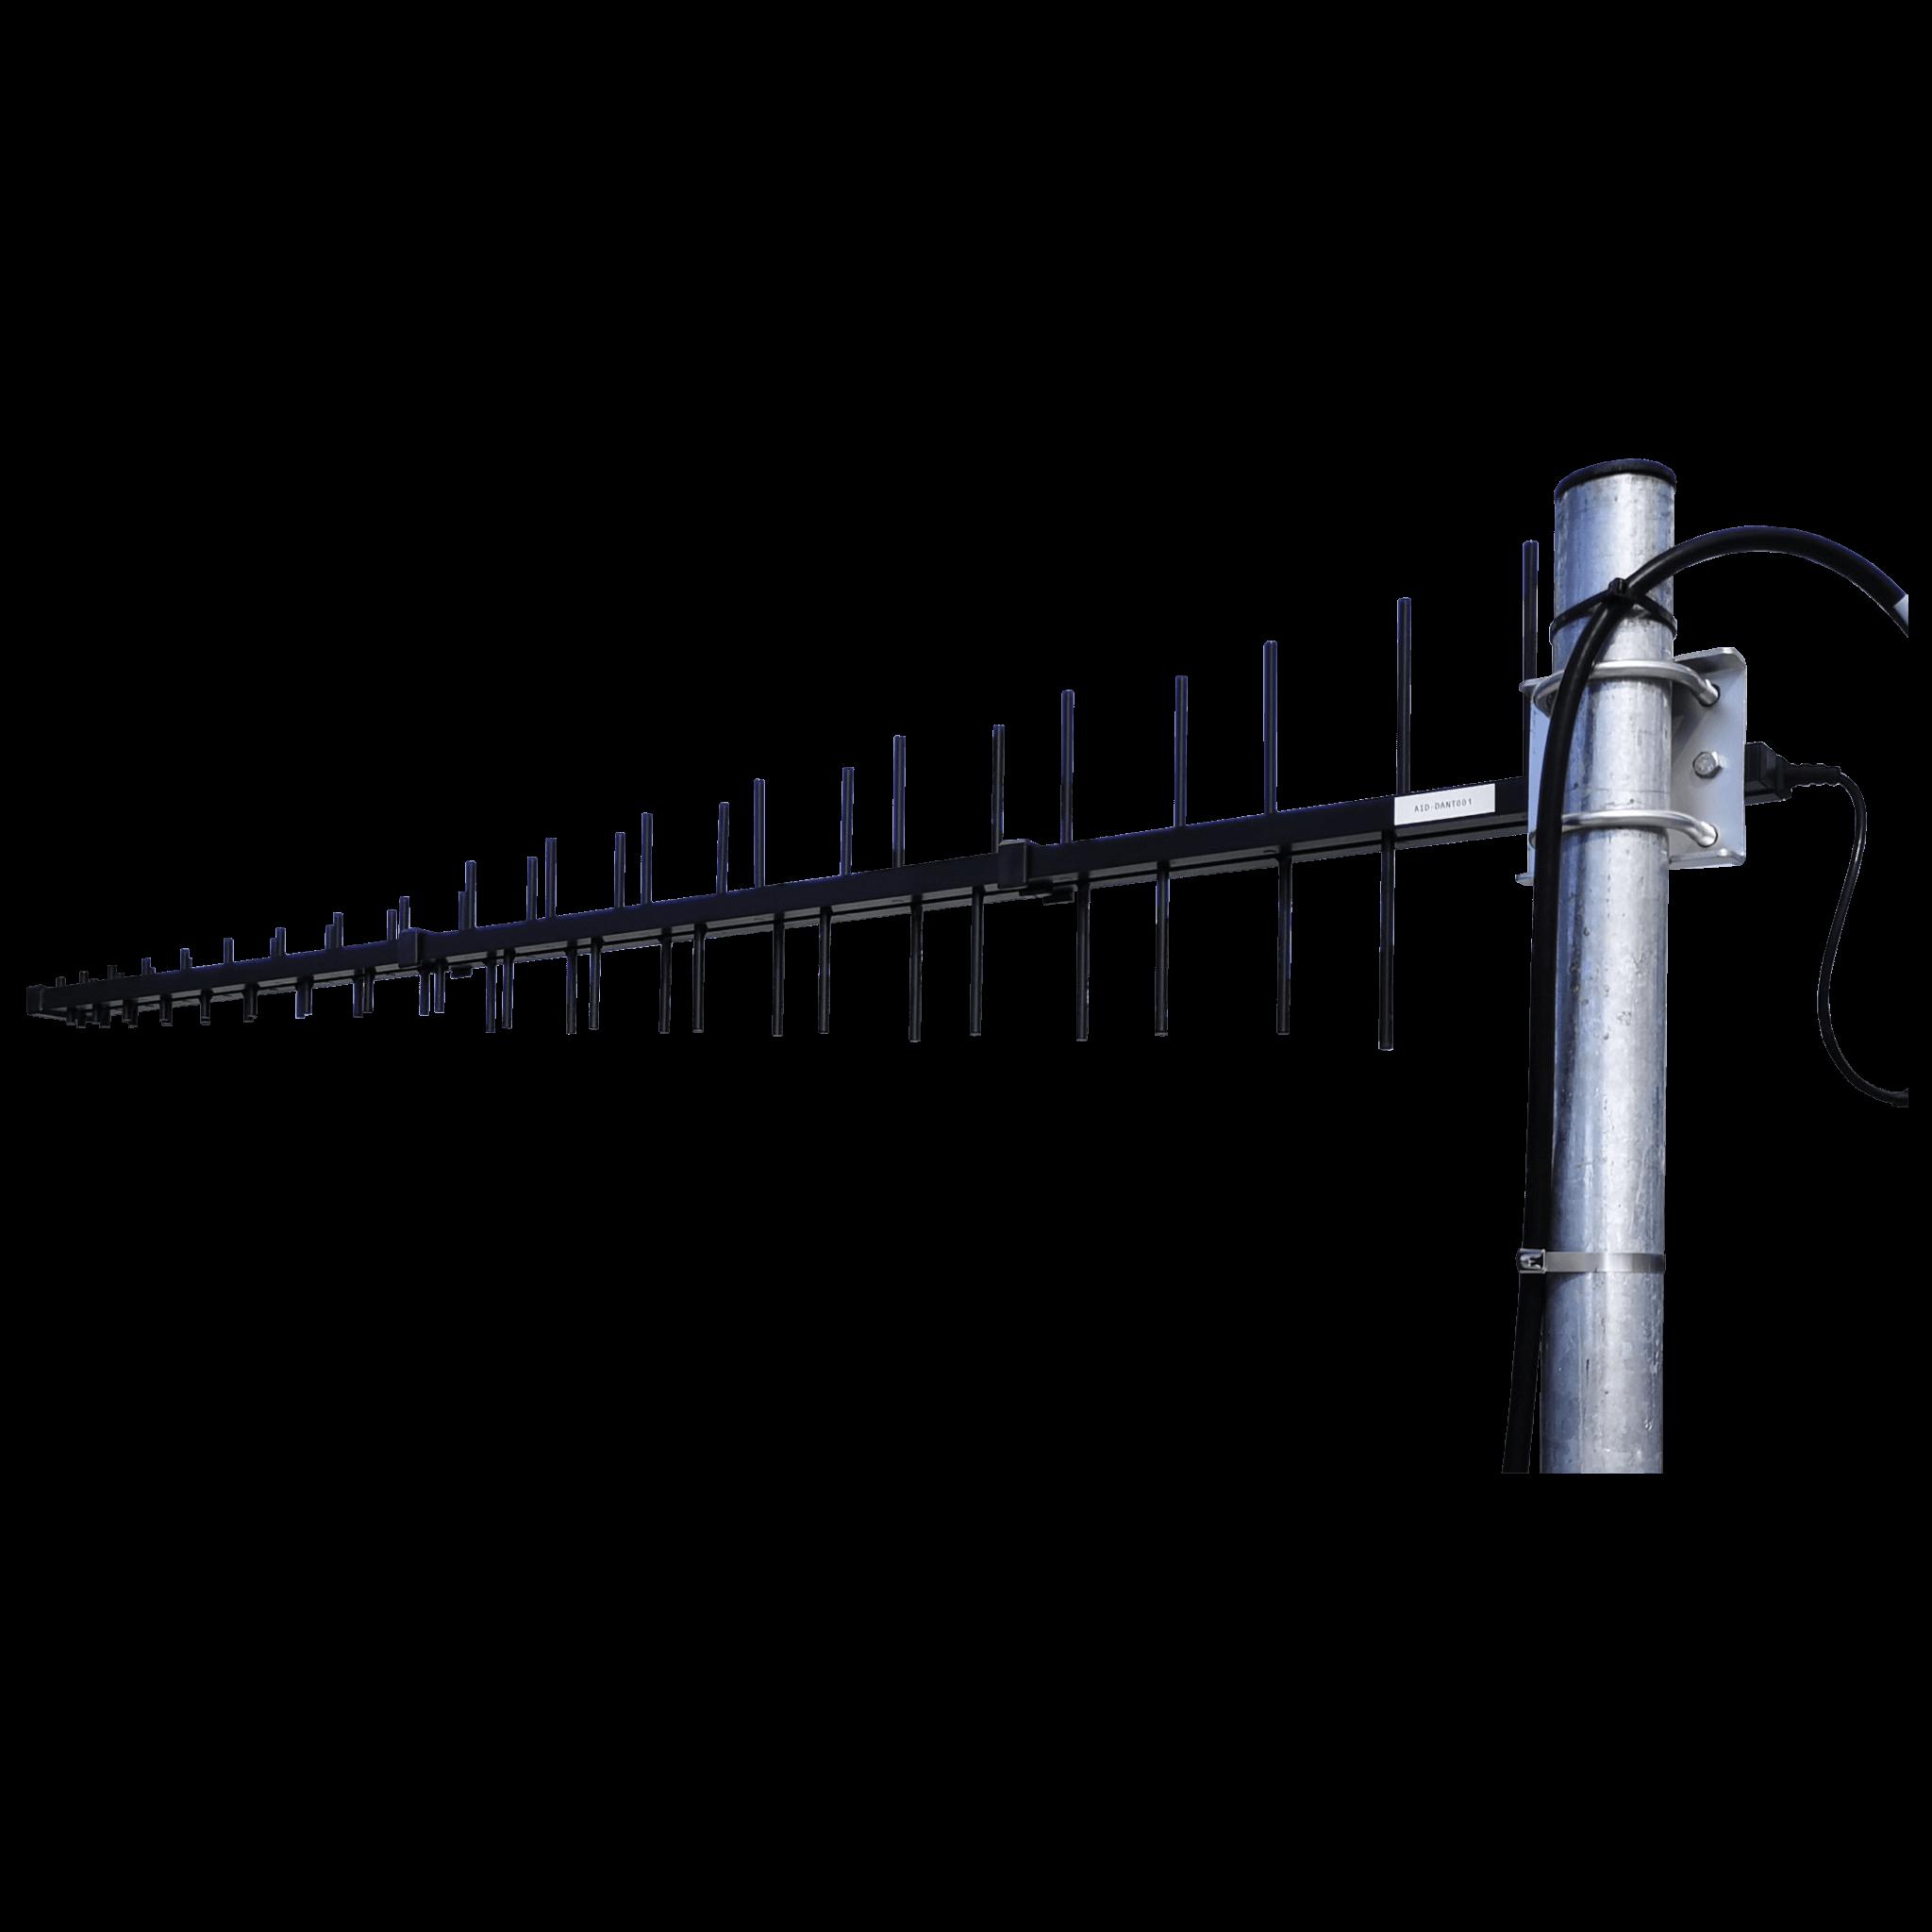 Blackhawk Log Periodic antenna 4G 5G for Telstra Cel-Fi